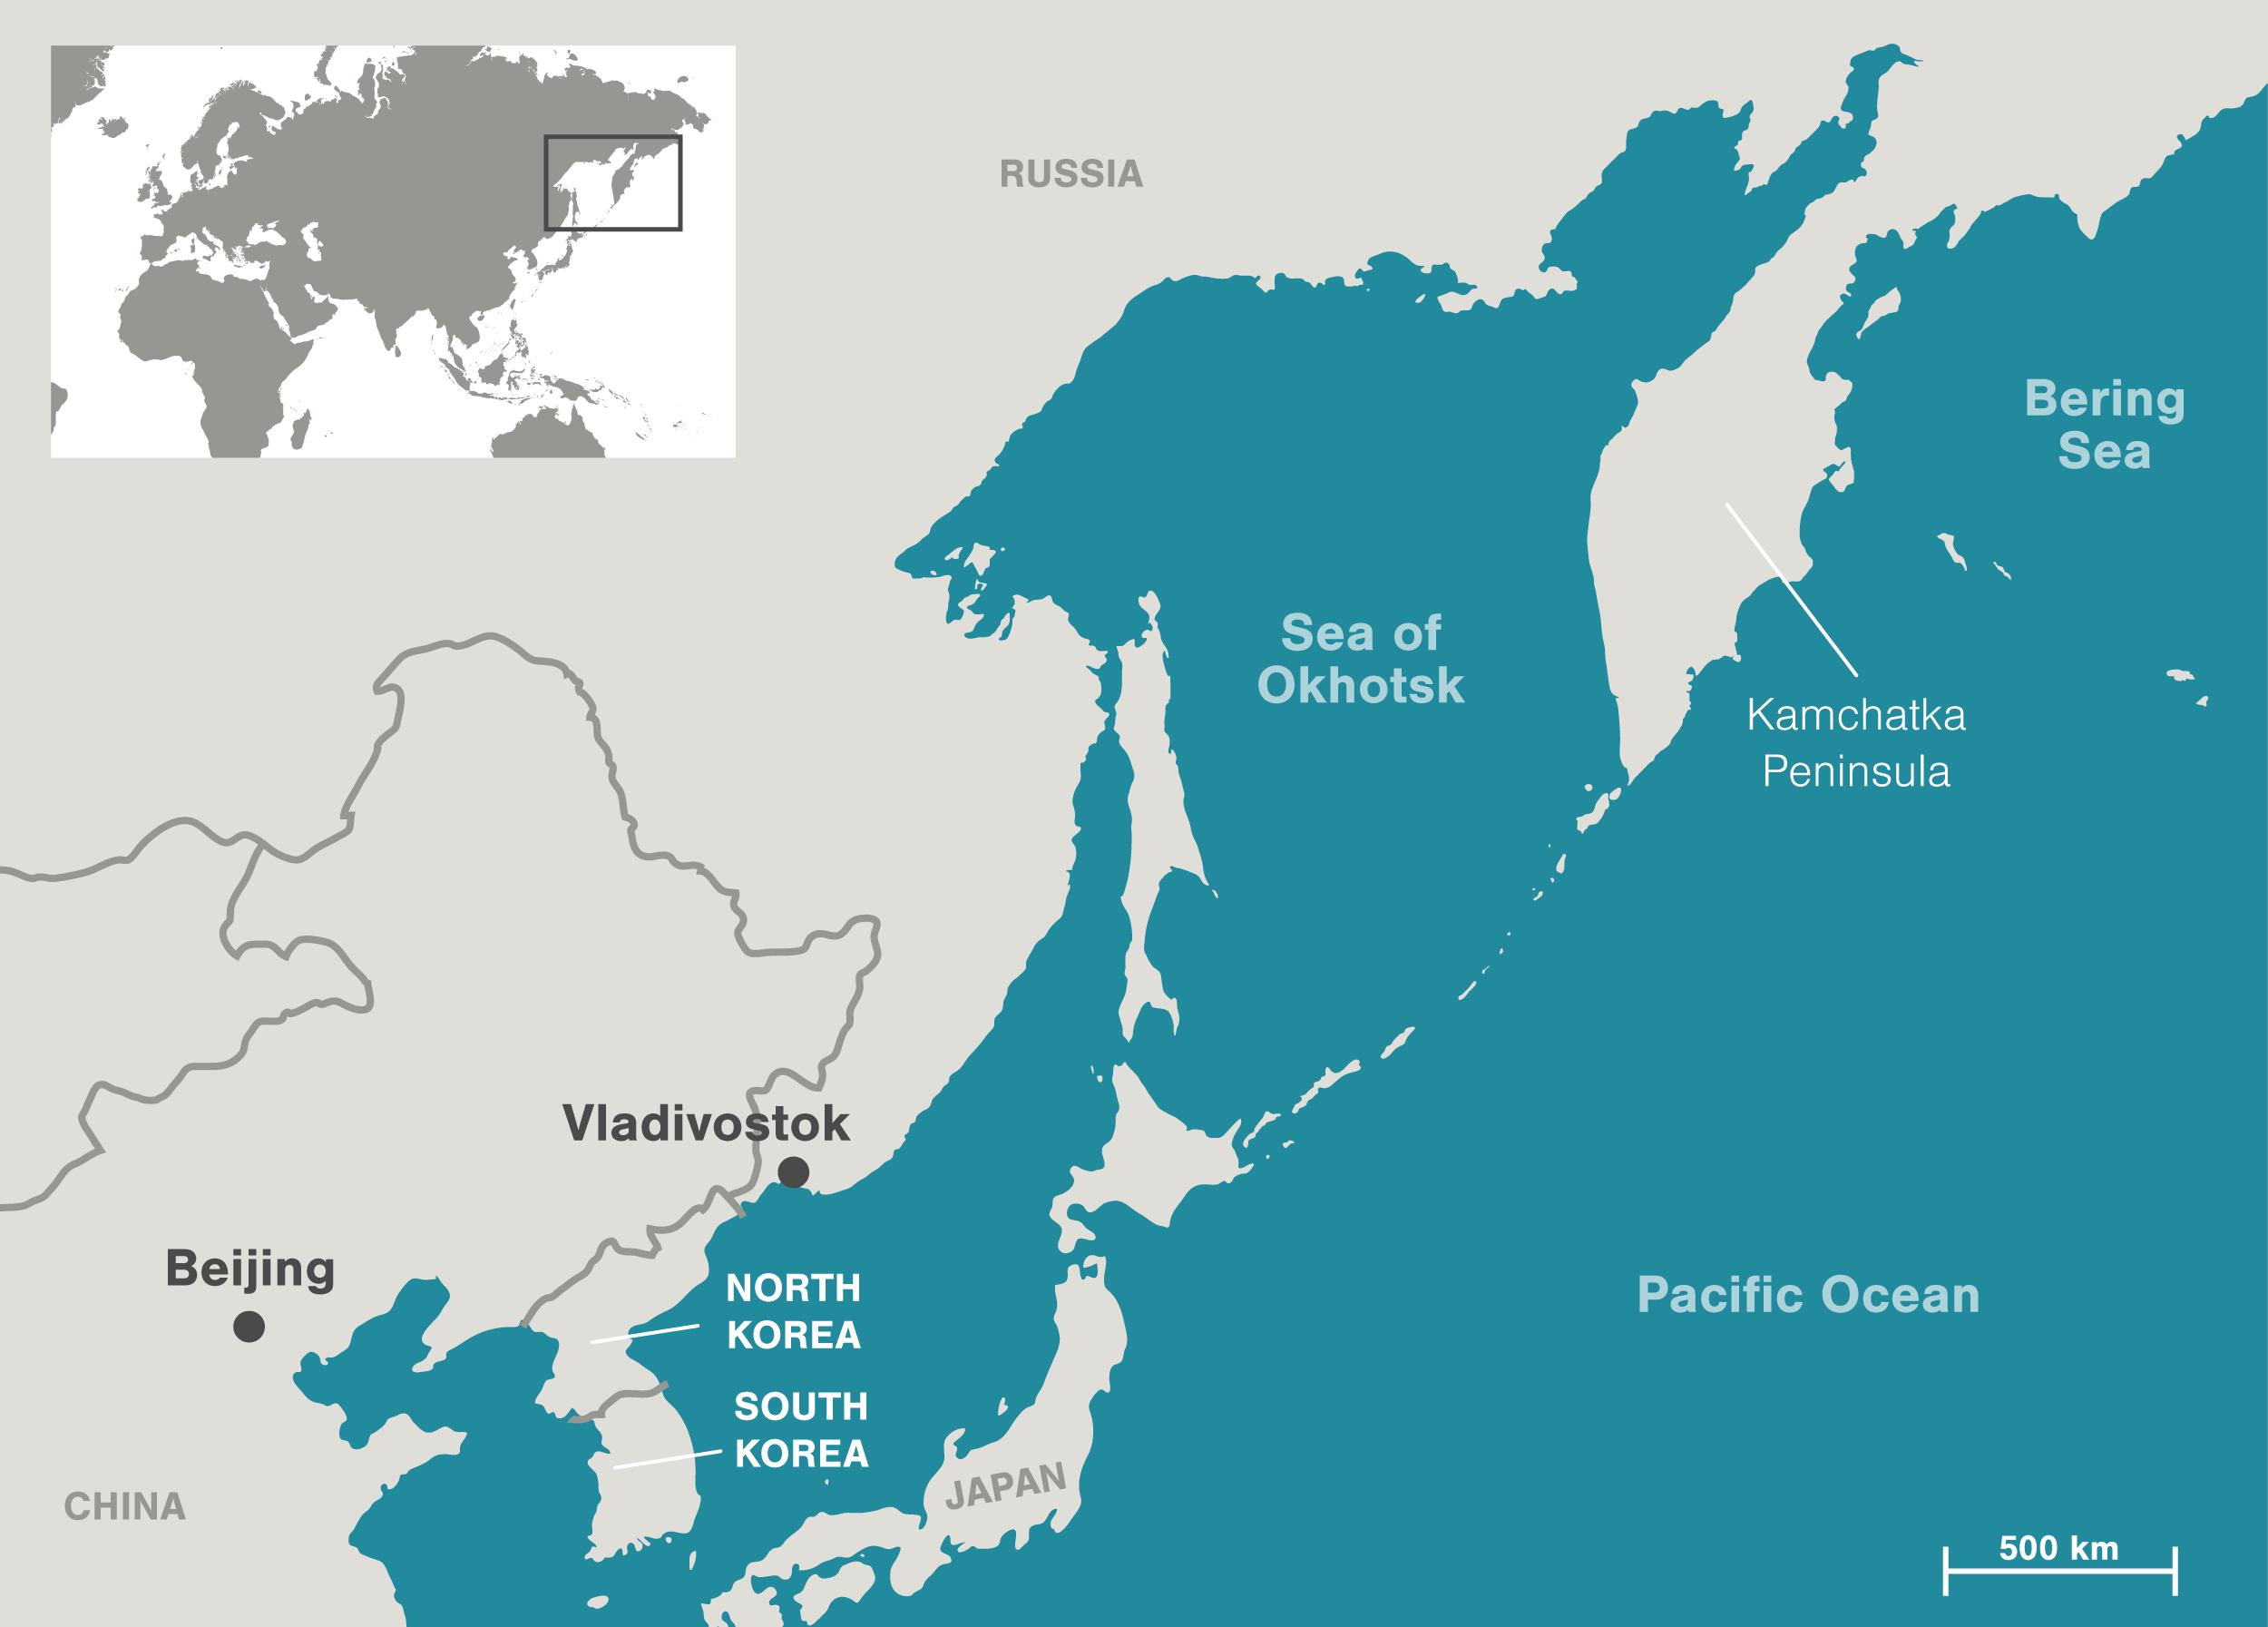 Bilderesultat for sea of okhotsk map | Cartography | Sea ... on shikoku japan map, hokkaido japan map, indonesia japan map, kuril islands japan map, alaska japan map, tsugaru strait japan map, pacific ocean japan map, nansei japan map, japan korea strait map, tokyo japan map, akita japan map, sakhalin japan map, russia japan map, narita japan map, mount fuji japan map, iwo jima island japan map, kyoto japan map, japan japanese alps map, okinawa japan map, china japan map,